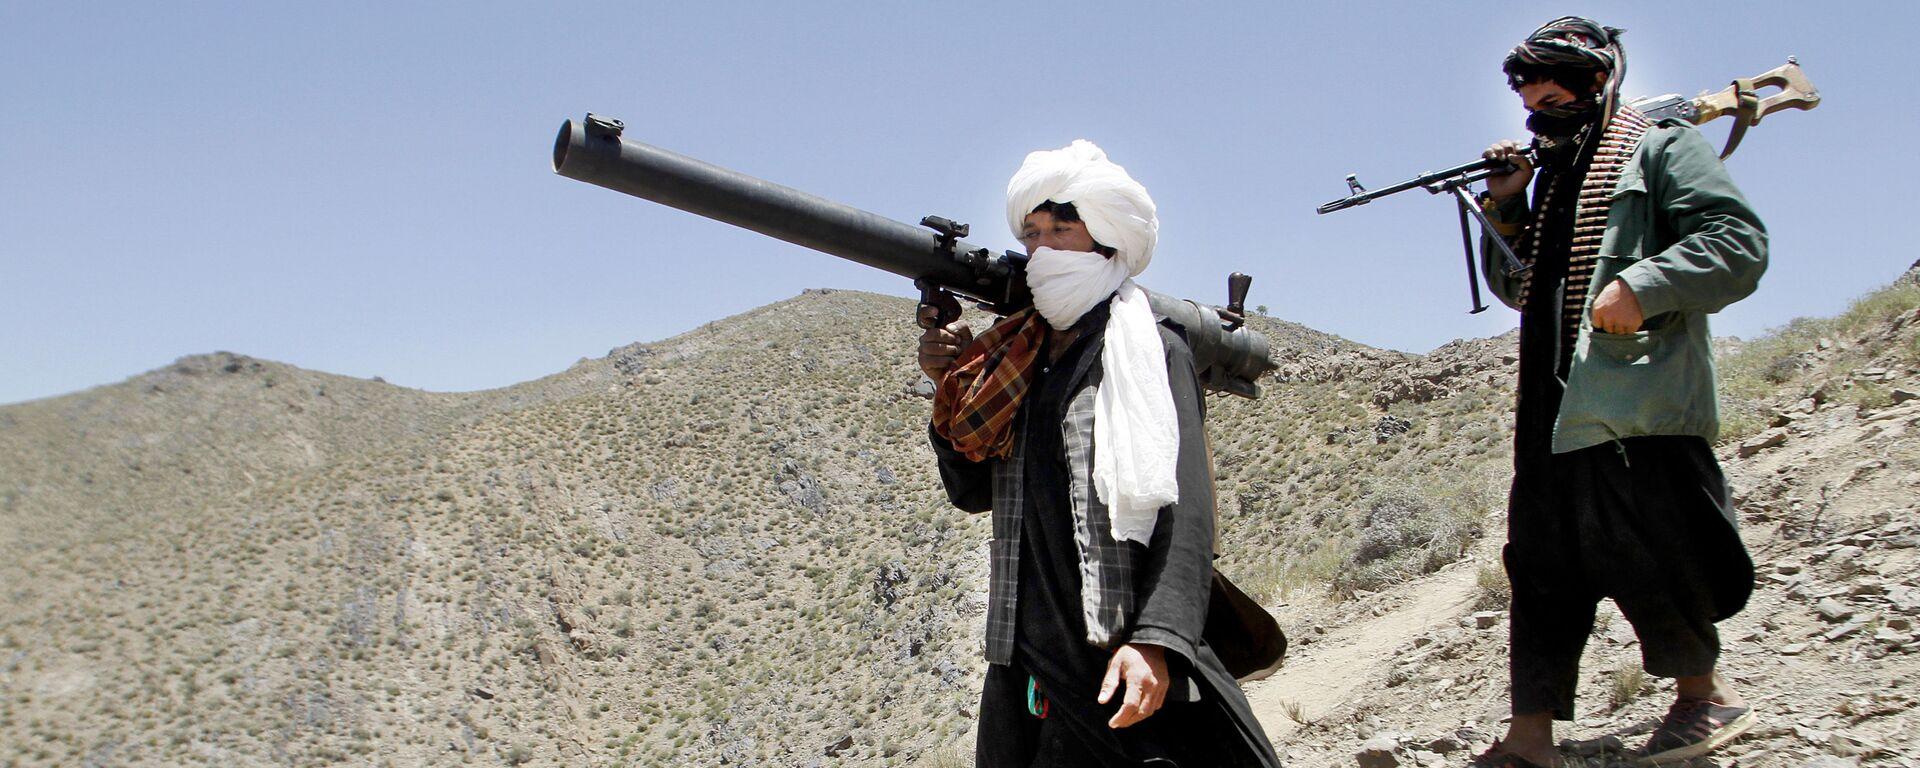 Члены террористического движения Талибан в Афганистане - Sputnik Таджикистан, 1920, 15.07.2021